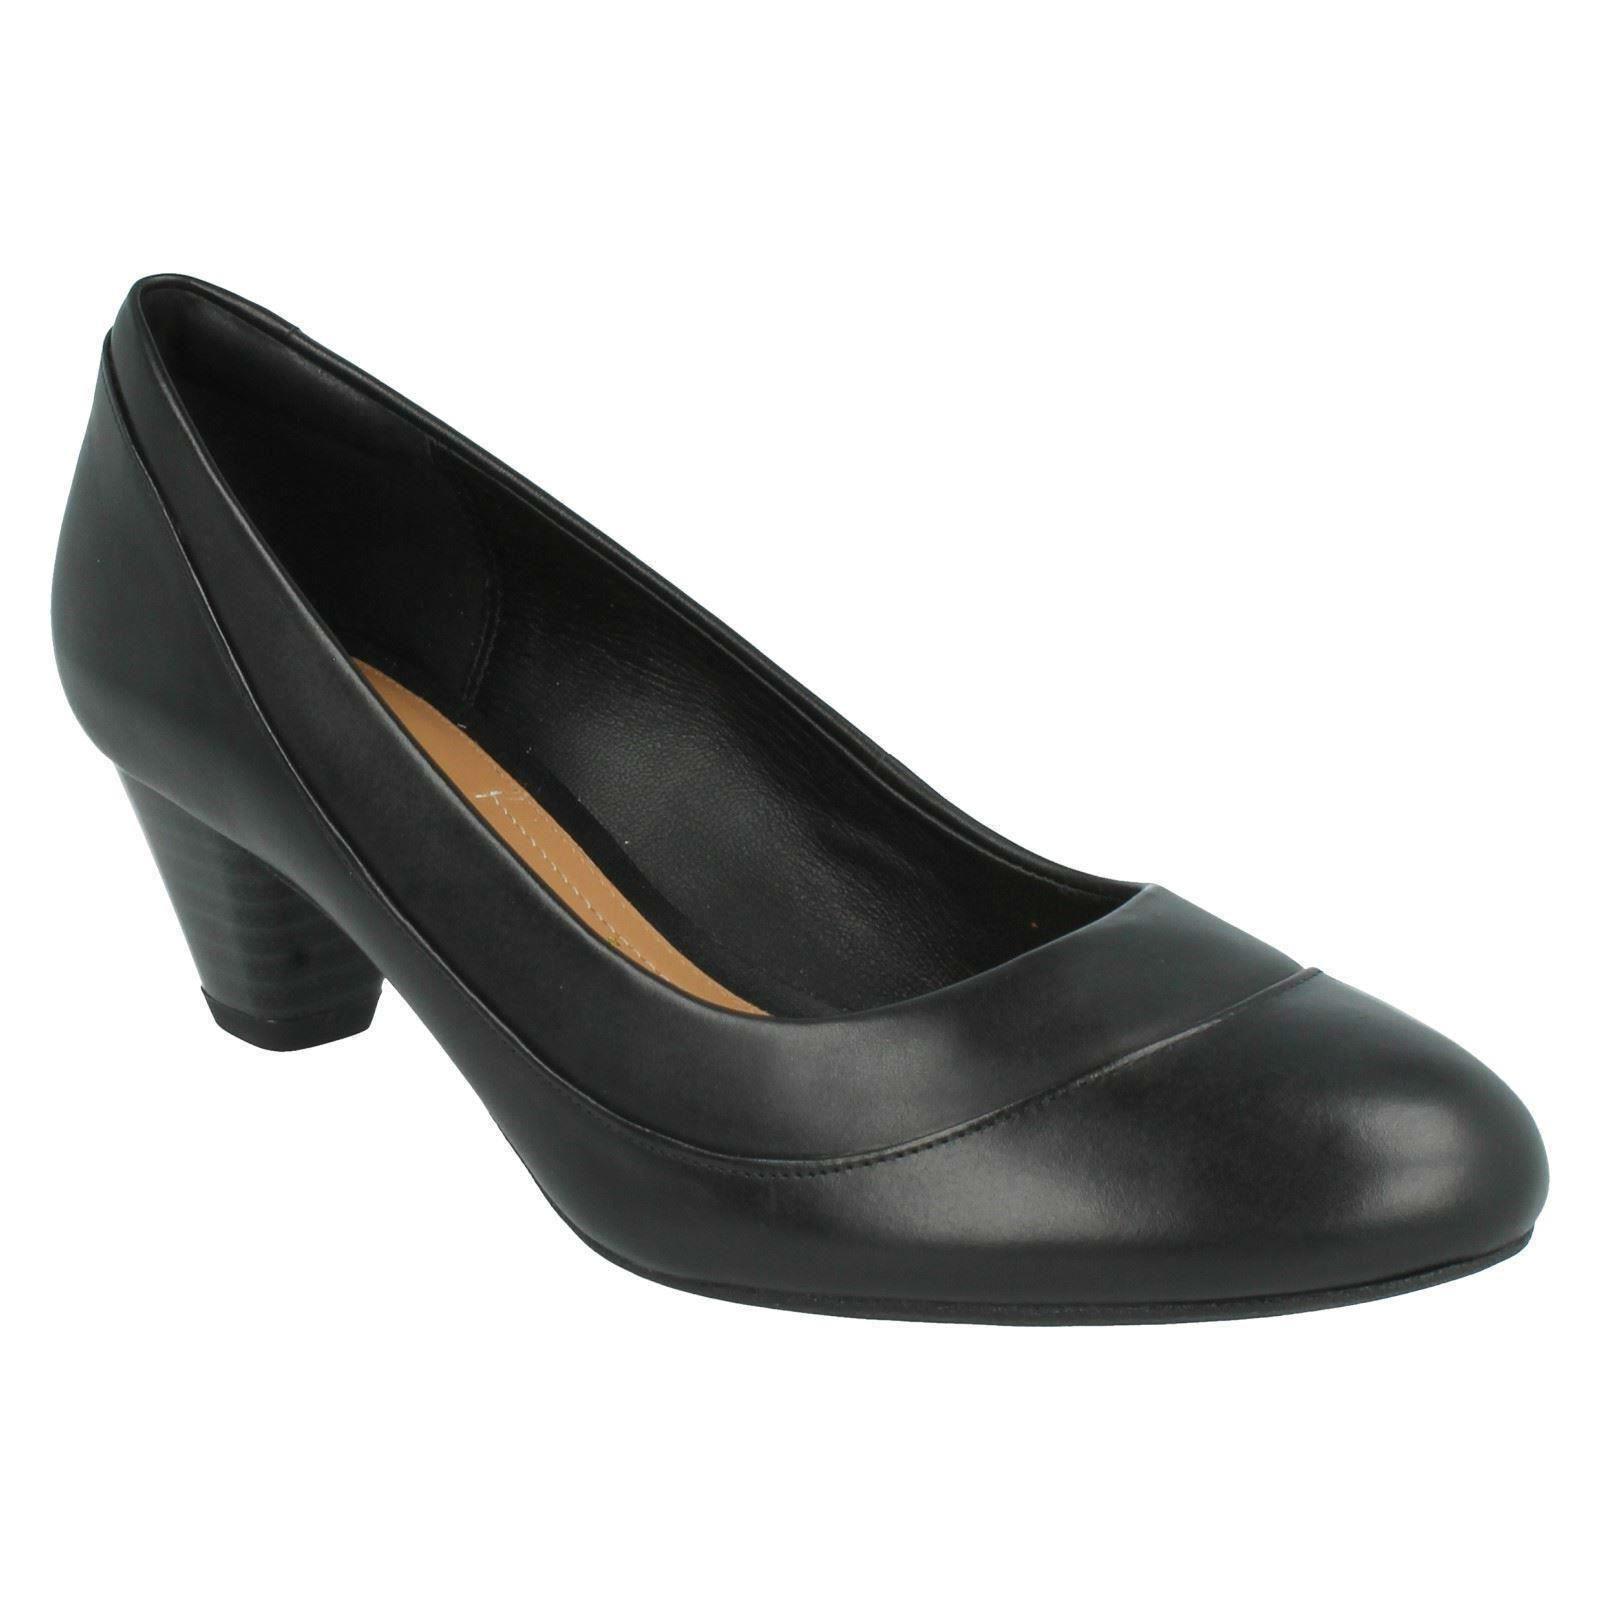 DENNY HARBOUR LADIES CLARKS SLIP ON MID HEEL WIDE FIT LEATHER SMART COURT Schuhe